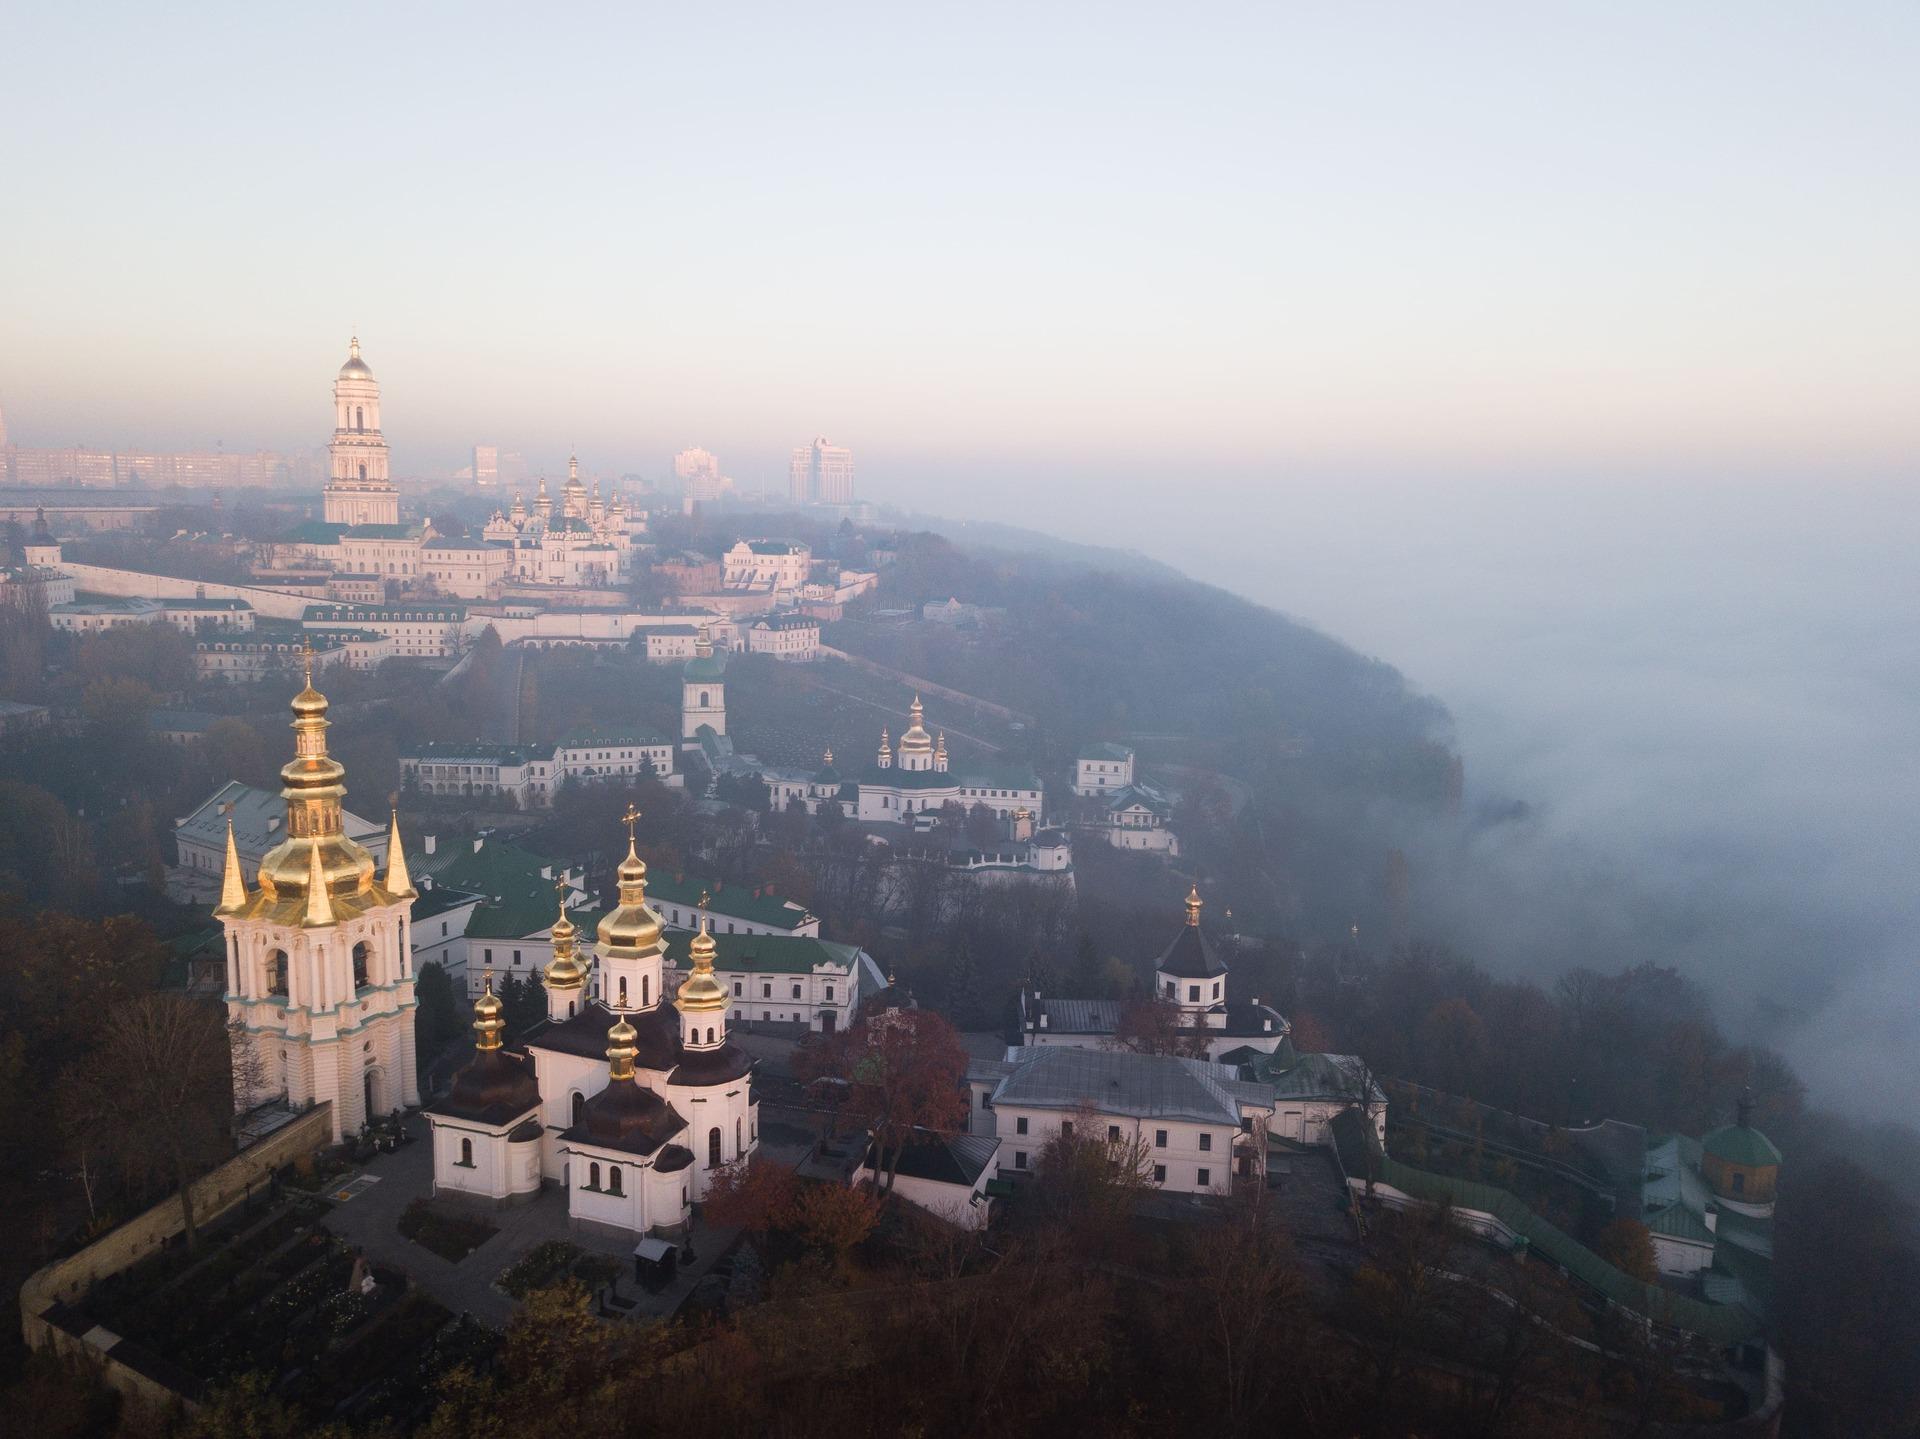 Києво-Печерська Лавра — монастирський комплекс, заснований 1051 року. Належить до культурної спадщини ЮНЕСКО. 3 листопада 2020 року. Фото: Дмитро Бартош.